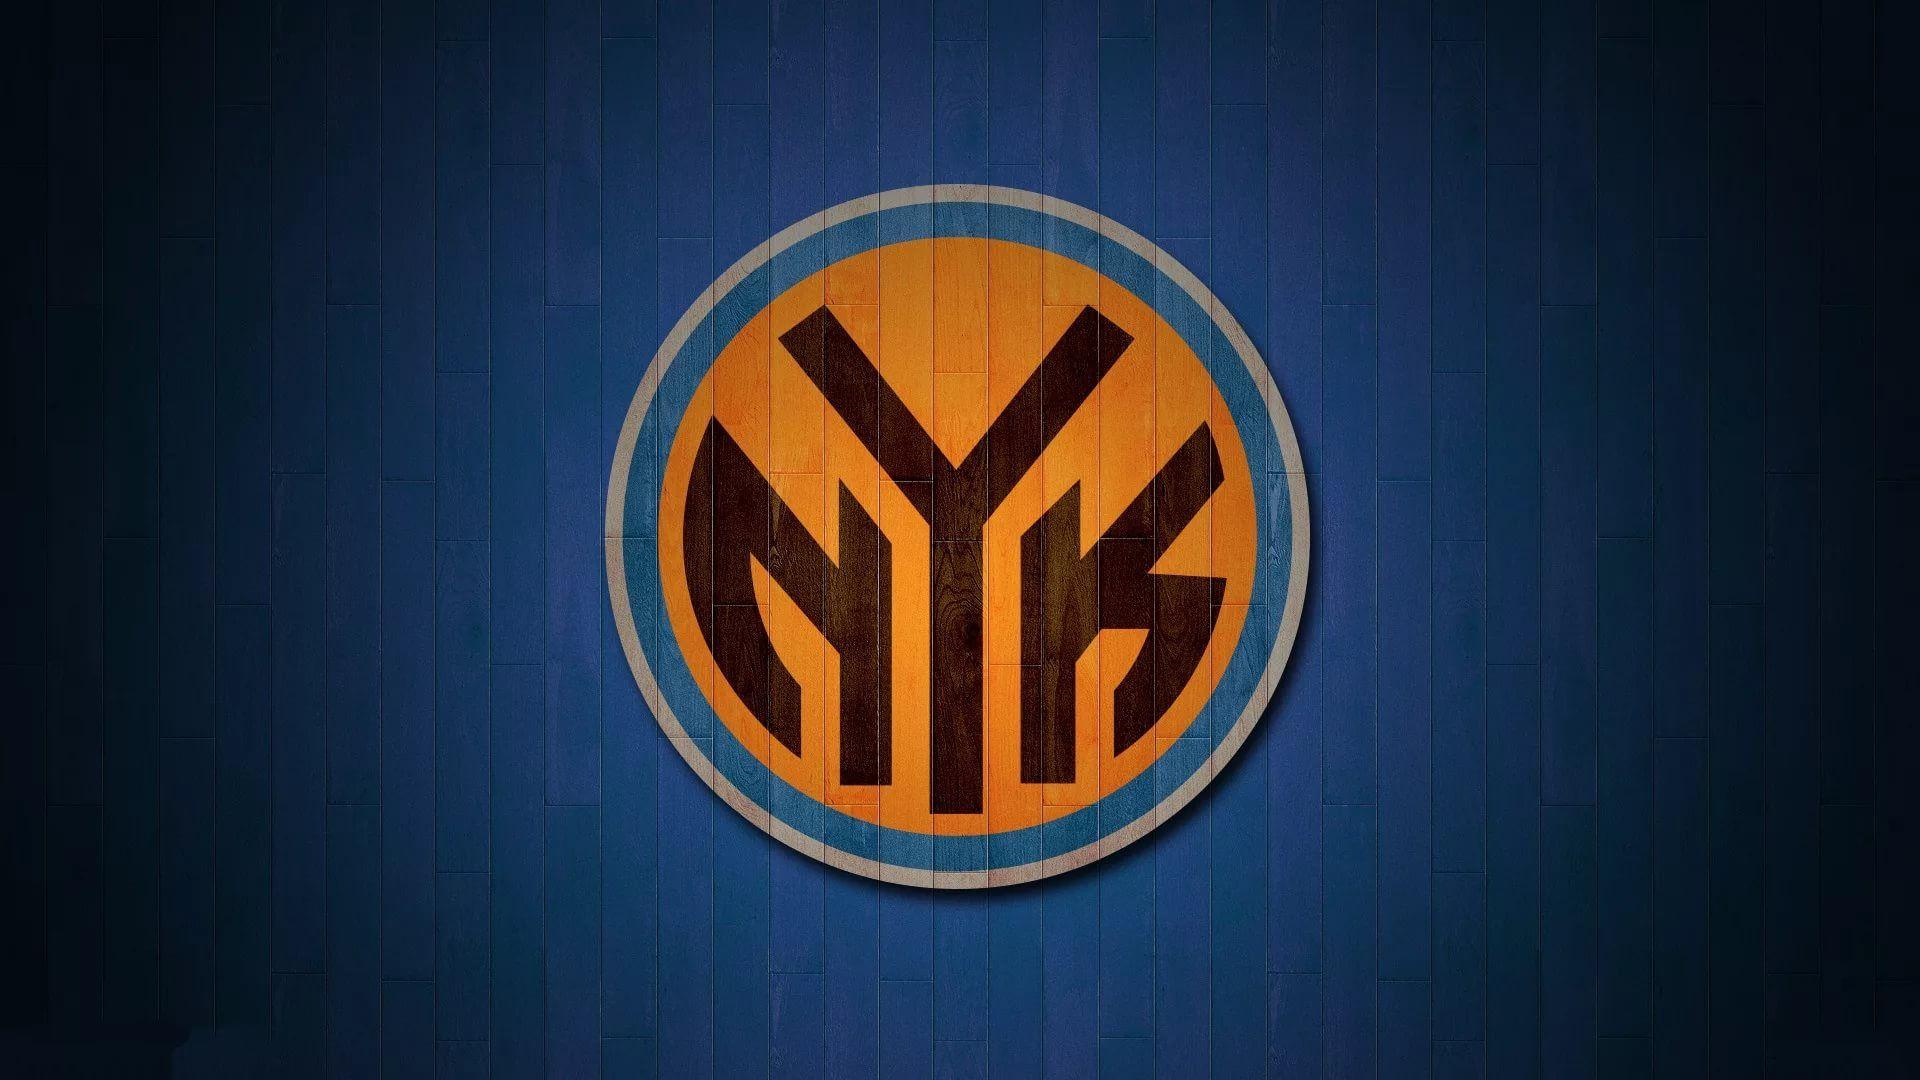 New York Knicks Free Desktop Wallpaper